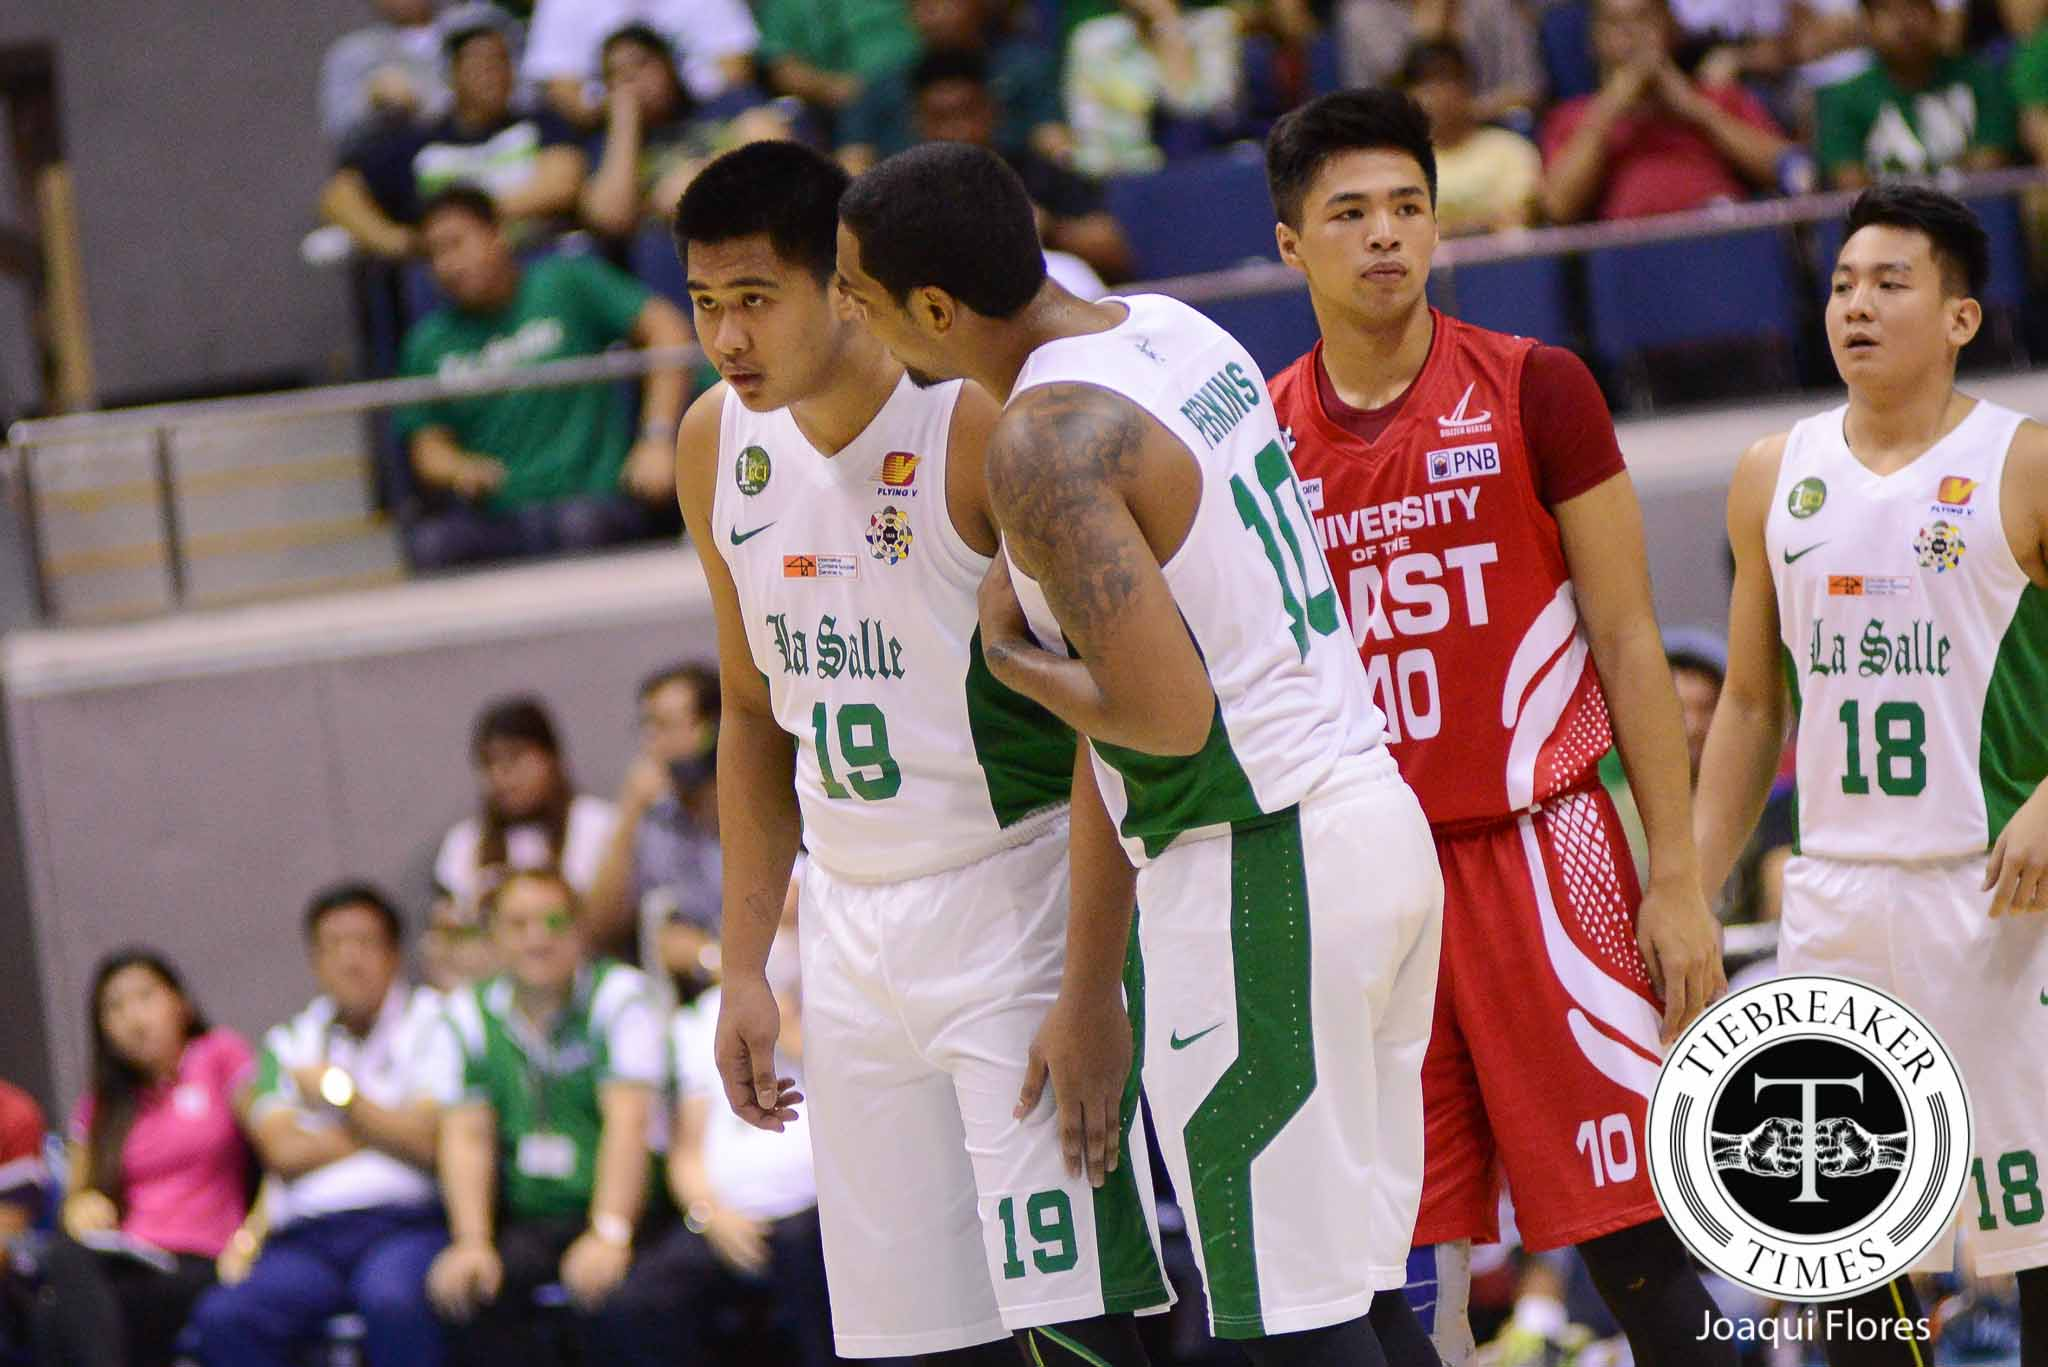 UAAP-78-DLSU-vs.-UE-Muyang-6705 Muyang grateful to have represented Pampanga in MPBL before entering PBA Draft Basketball MPBL News PBA  - philippine sports news